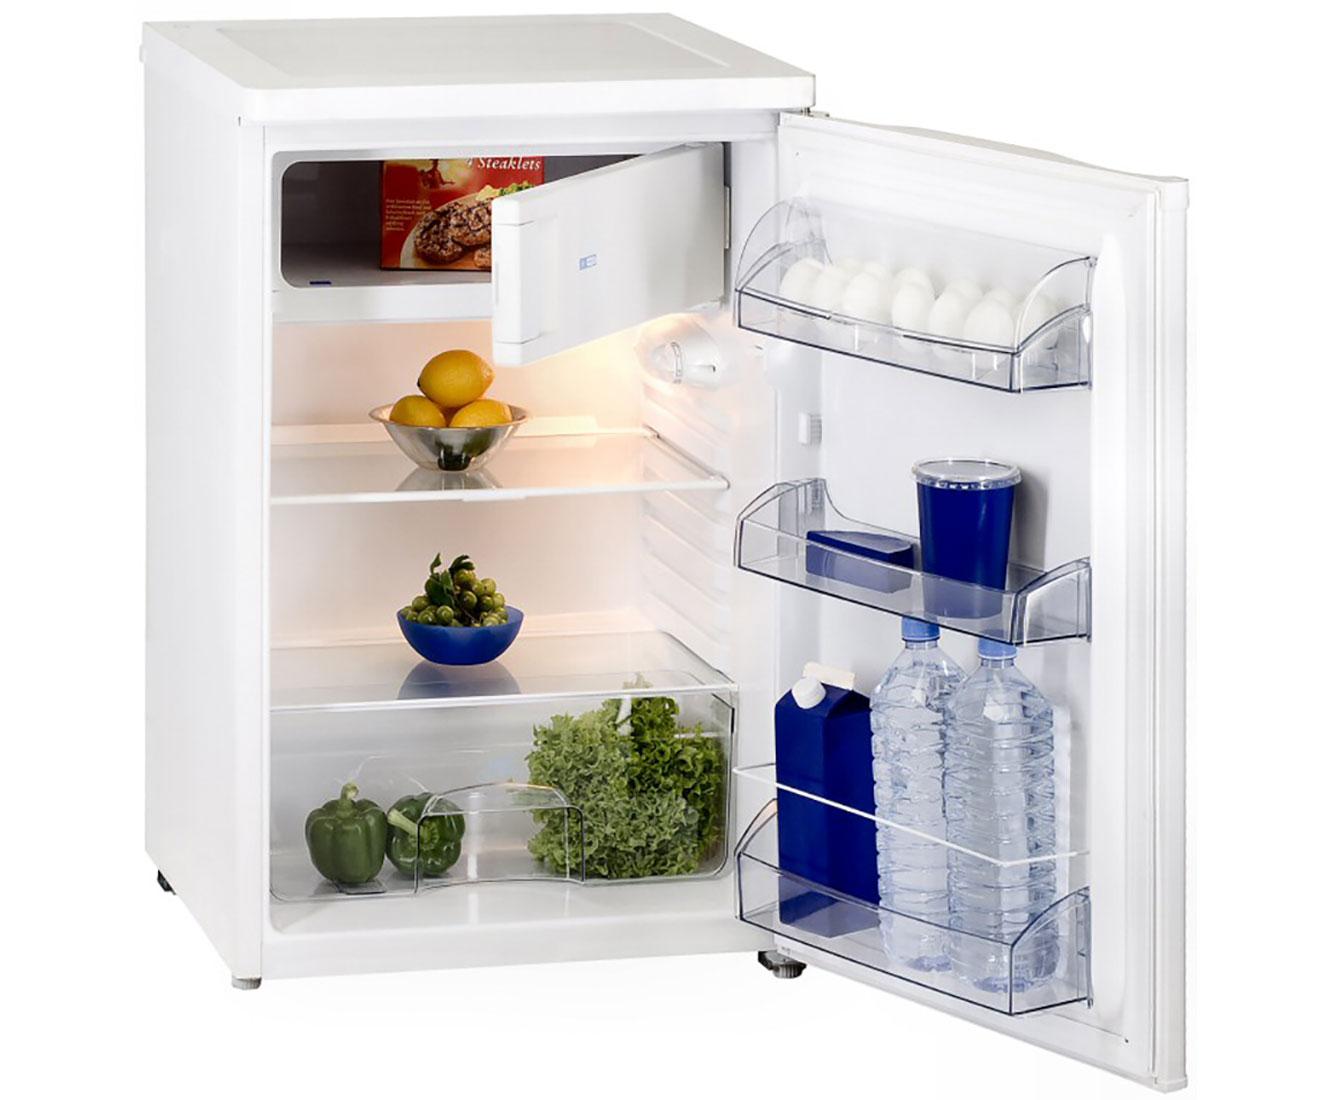 Kleiner Kühlschrank Real : Kleiner kühlschrank bei real mini kühlschrank mit geringer tiefe